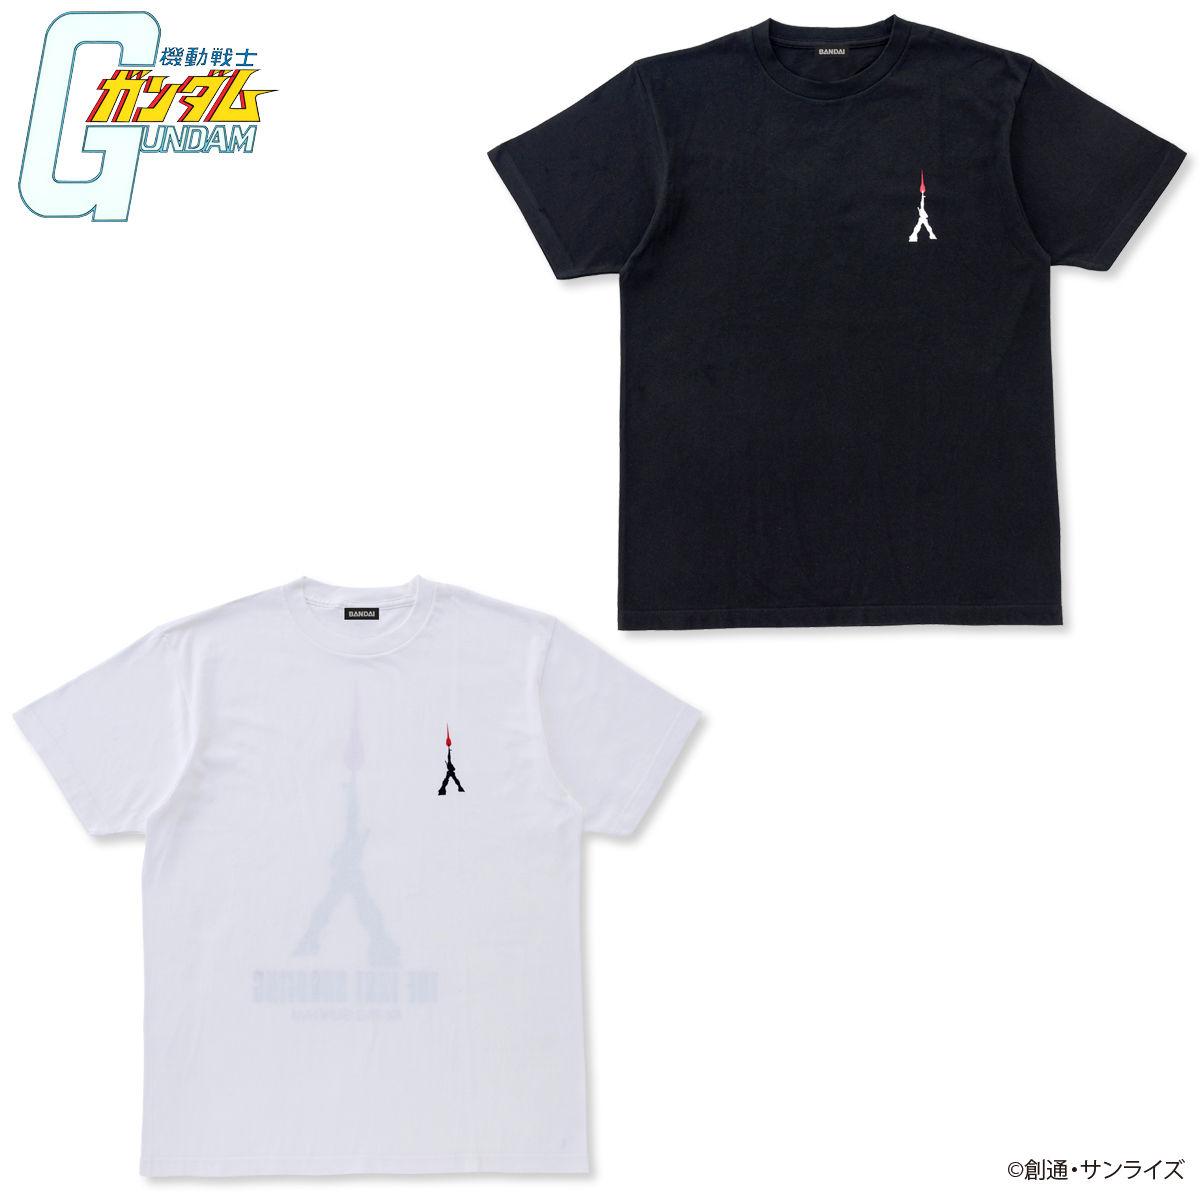 Mobile Suit Gundam The Last Shooting T-shirt